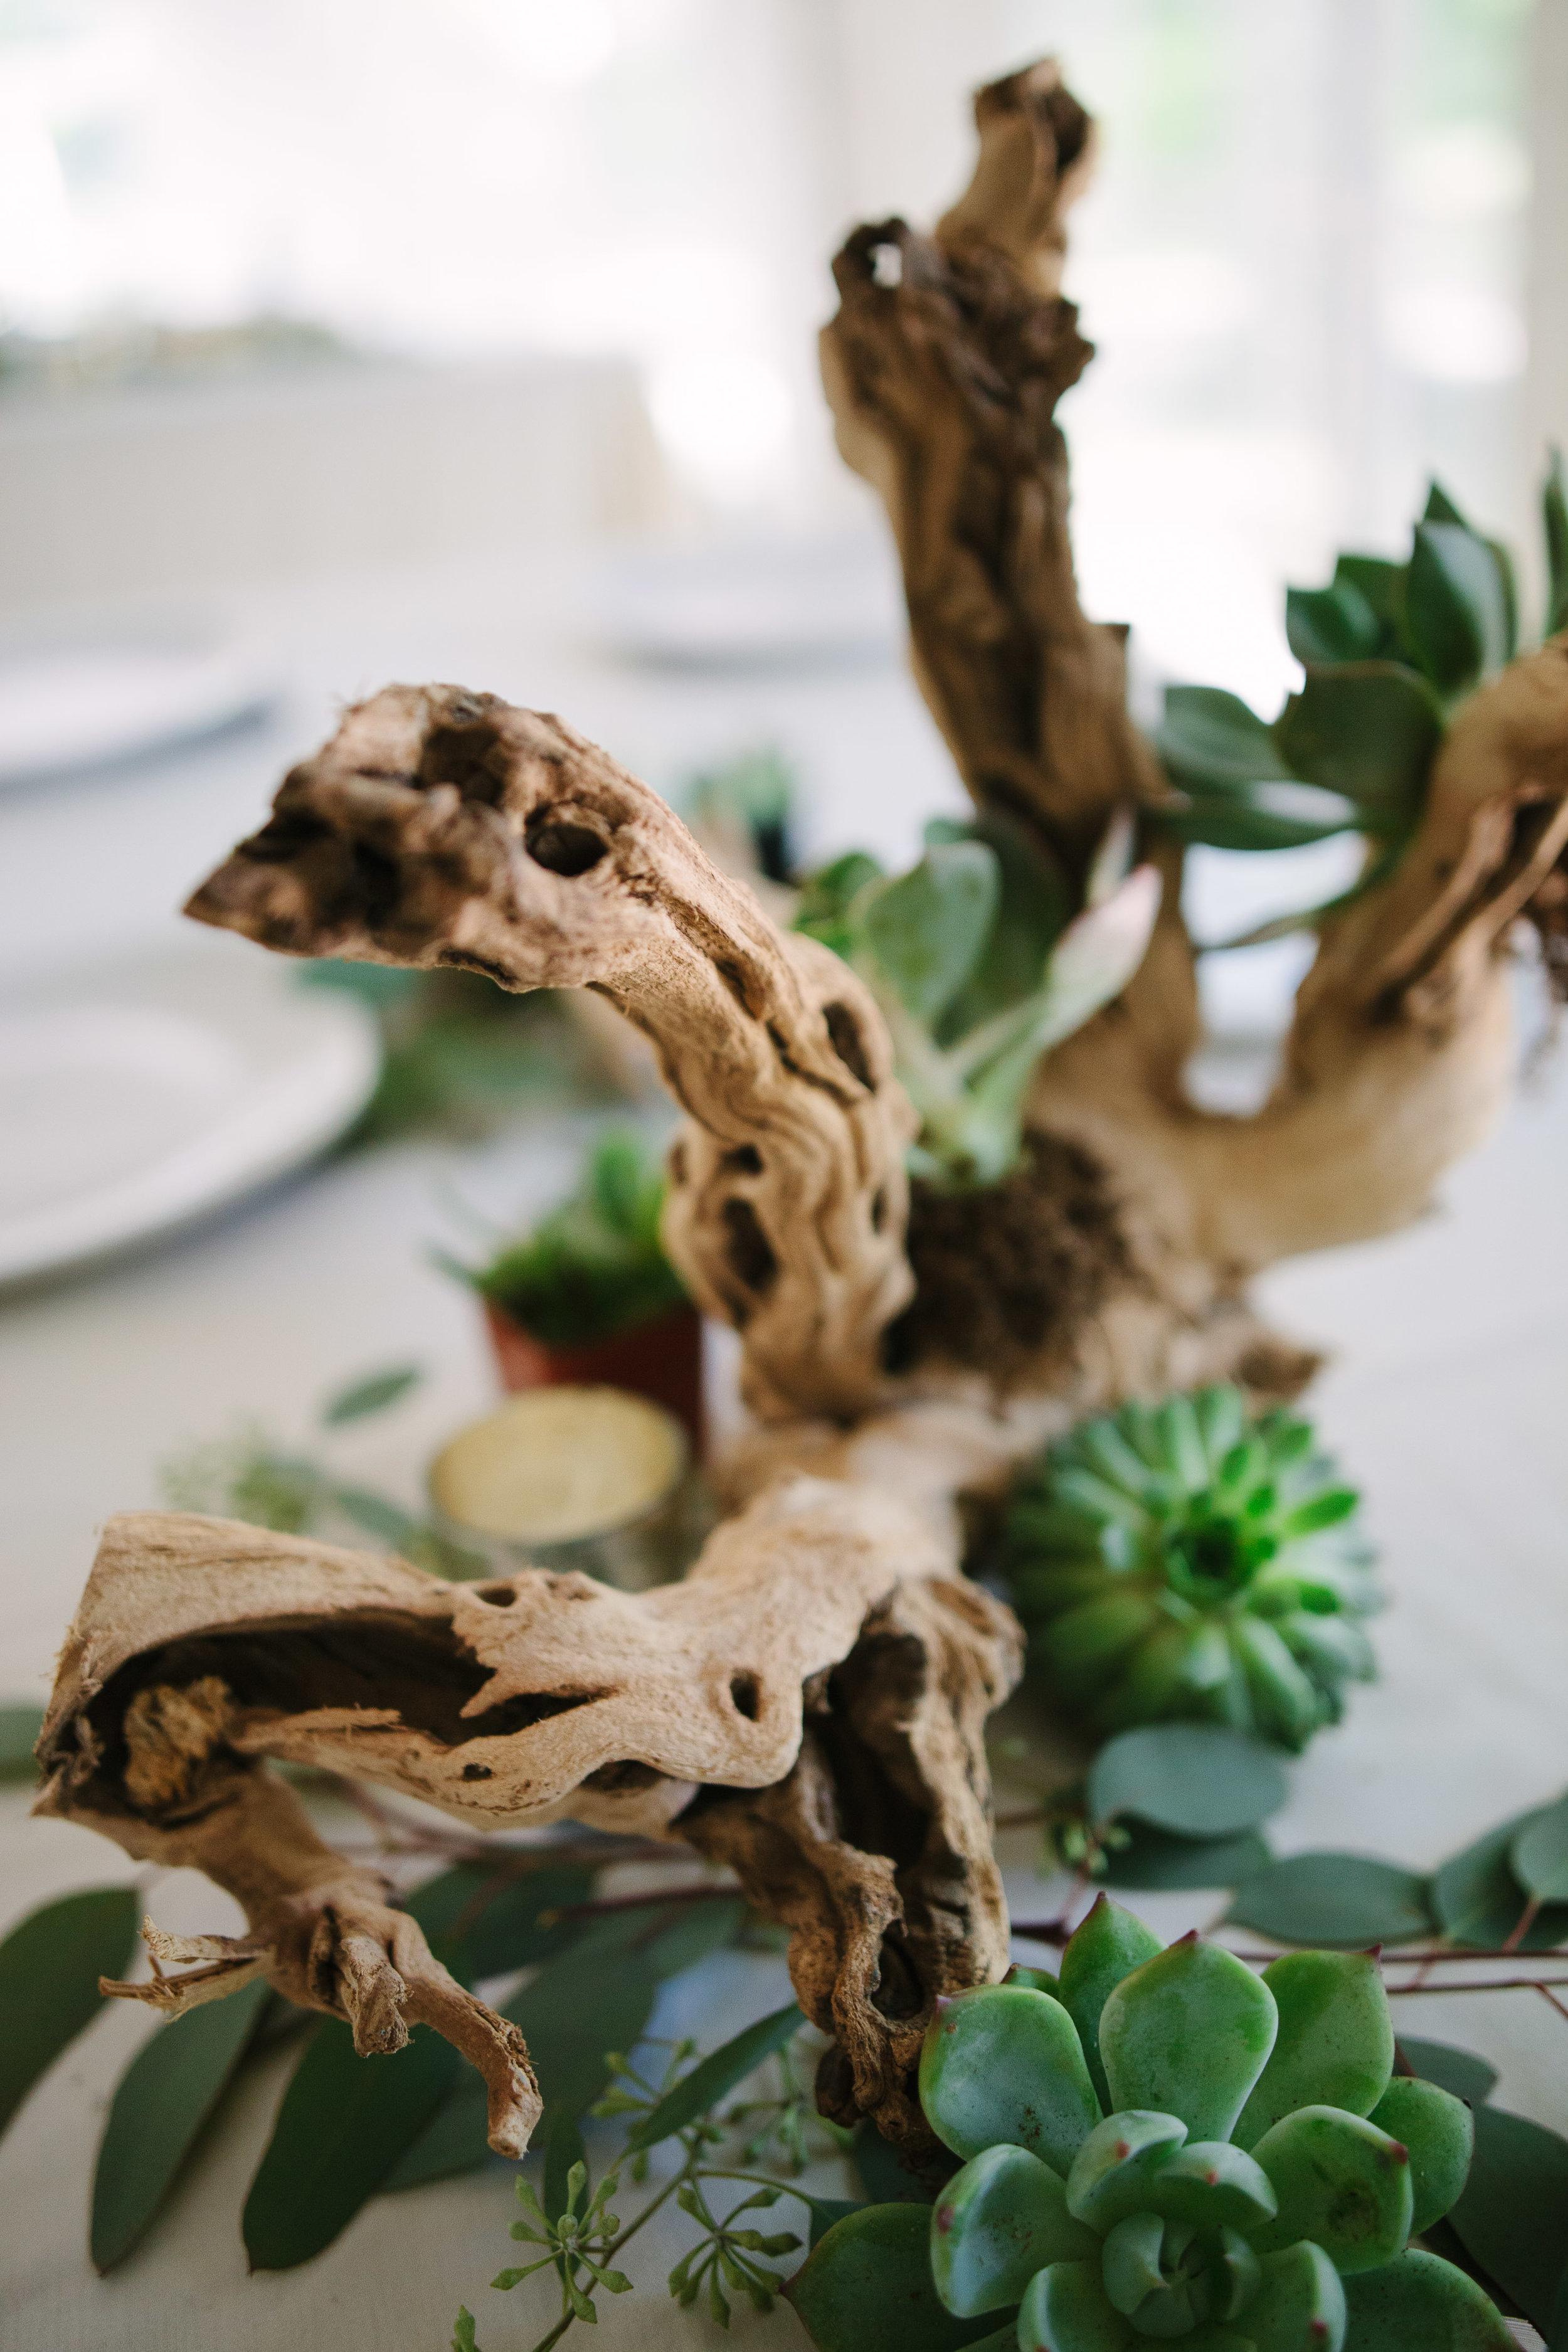 grand_rapids_wedding_rockford_wedding_richard_app_gallery_wedding_grand_rapids_wedding_photographer_summer_wedding_wabasis_lake_park_wedding_rustic_wedding-42.jpg